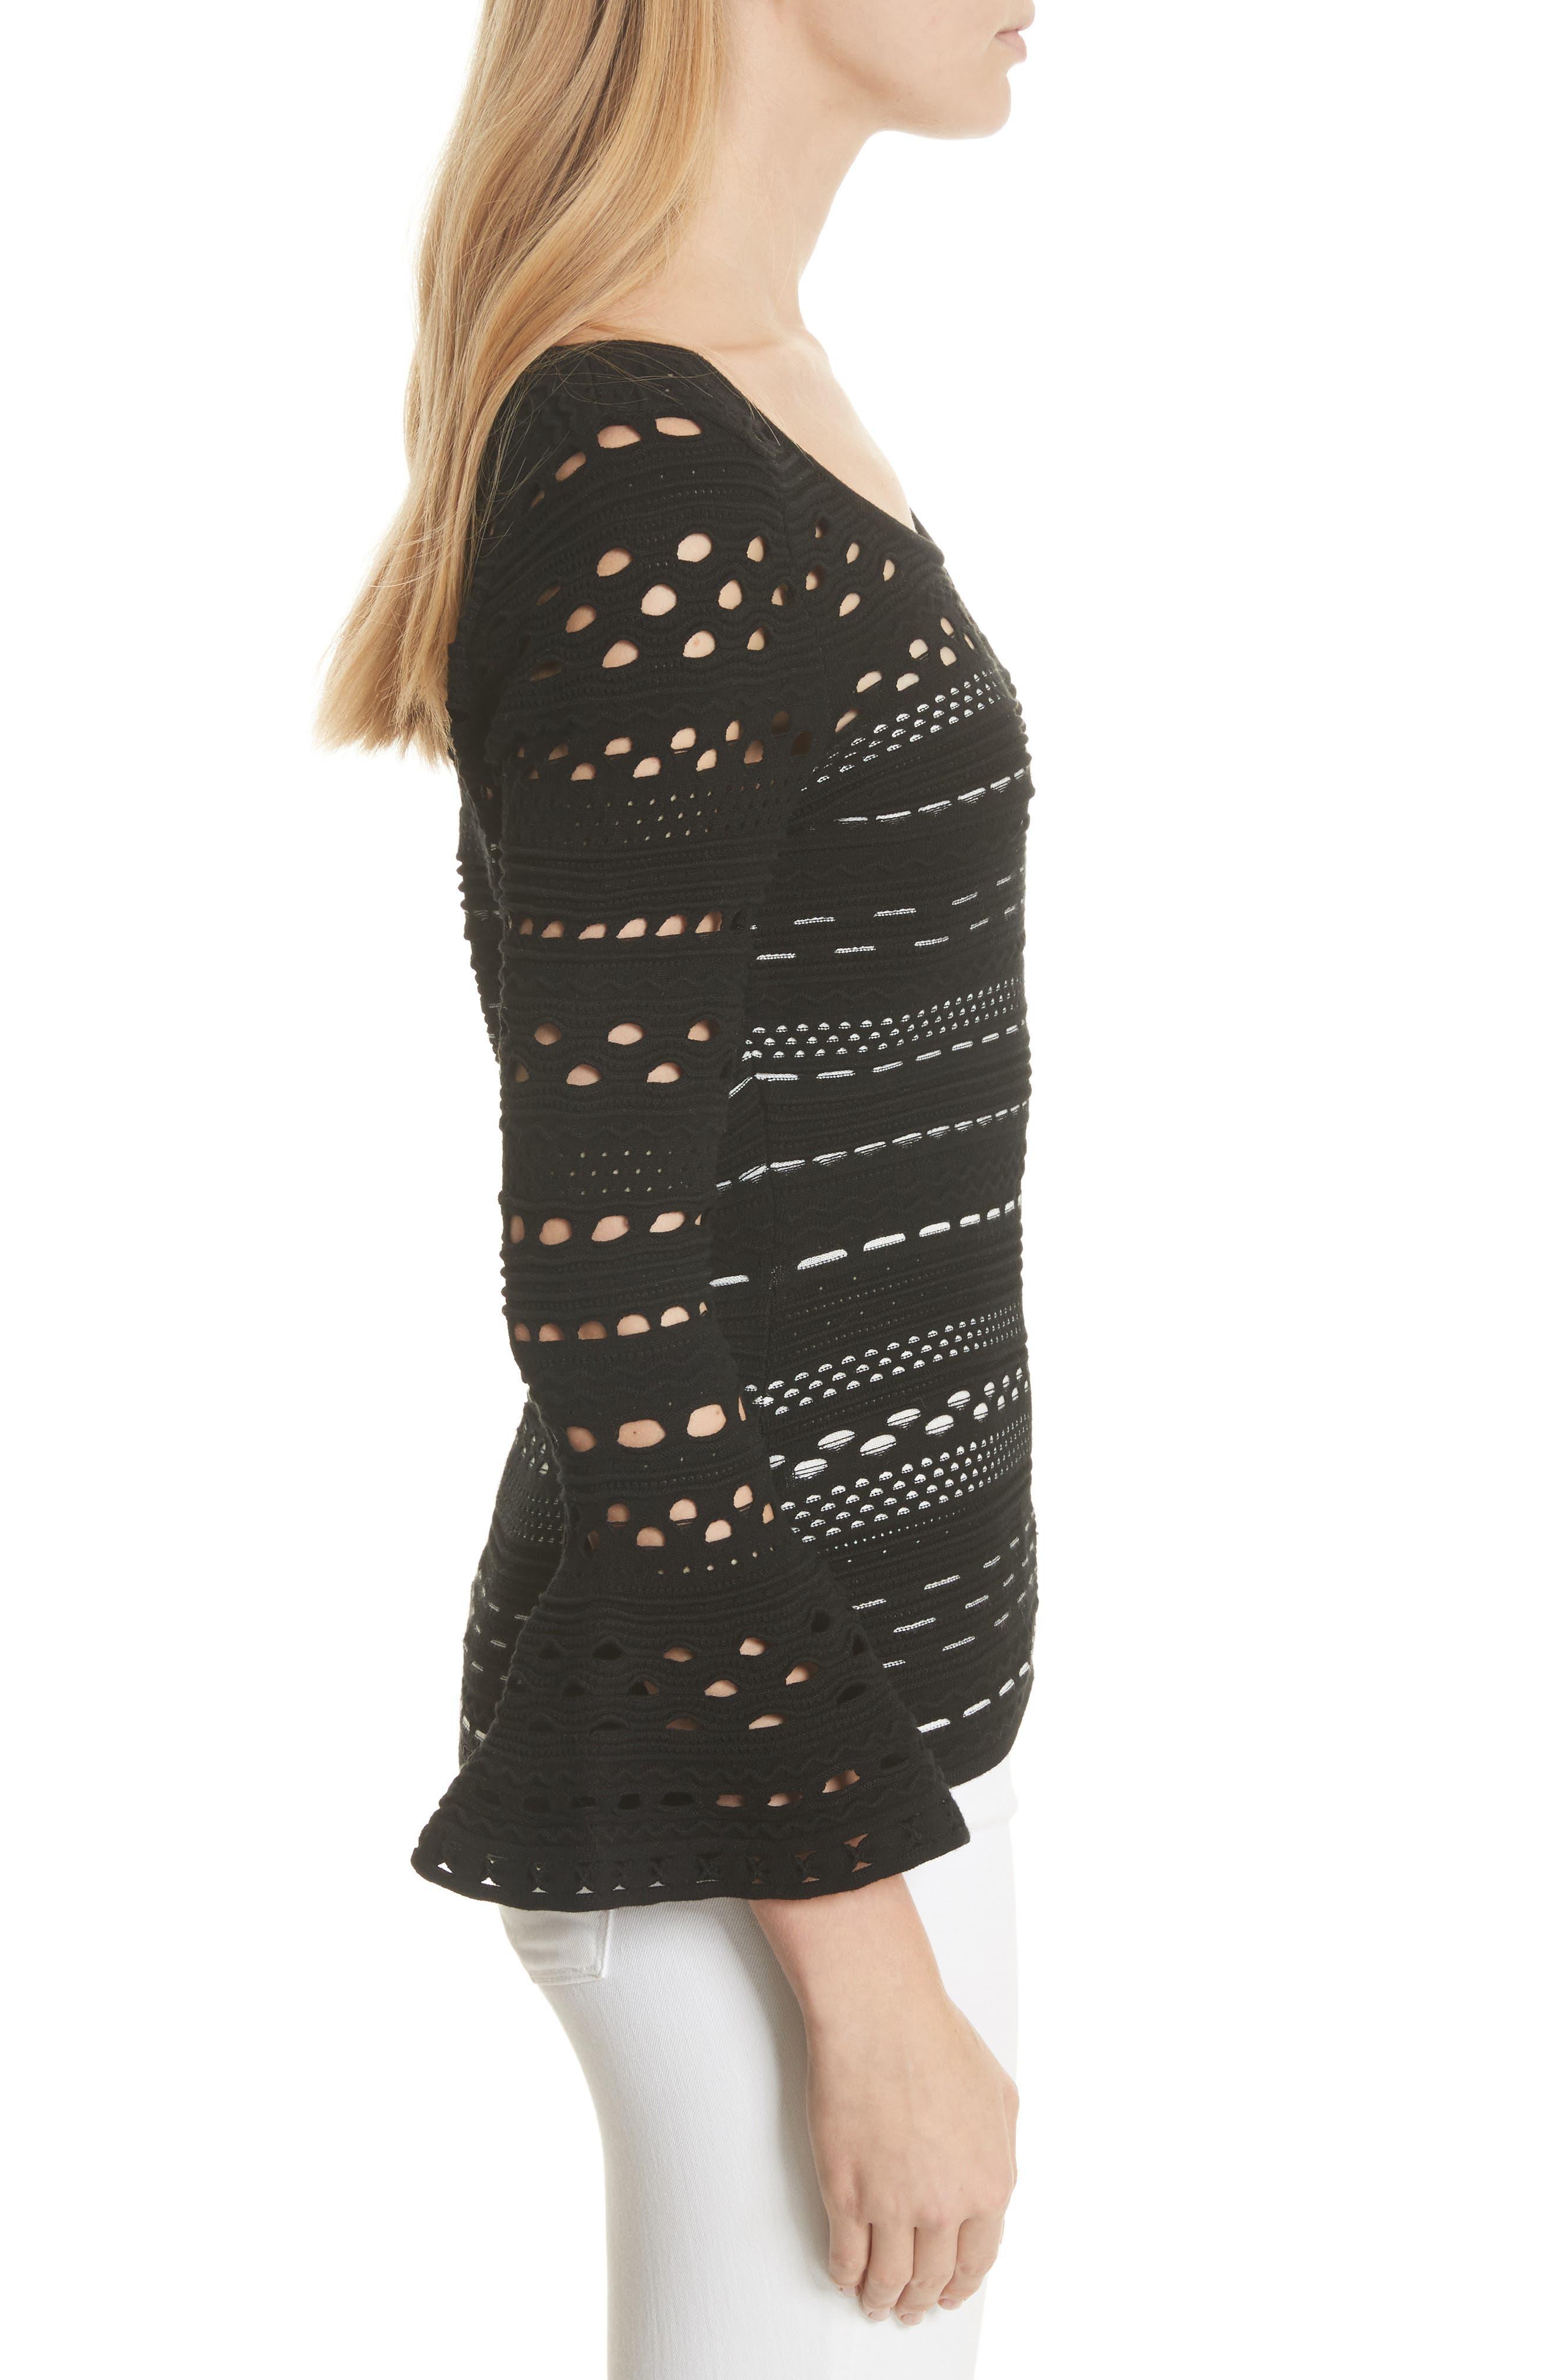 Lace Knit Top,                             Alternate thumbnail 3, color,                             Black/ White